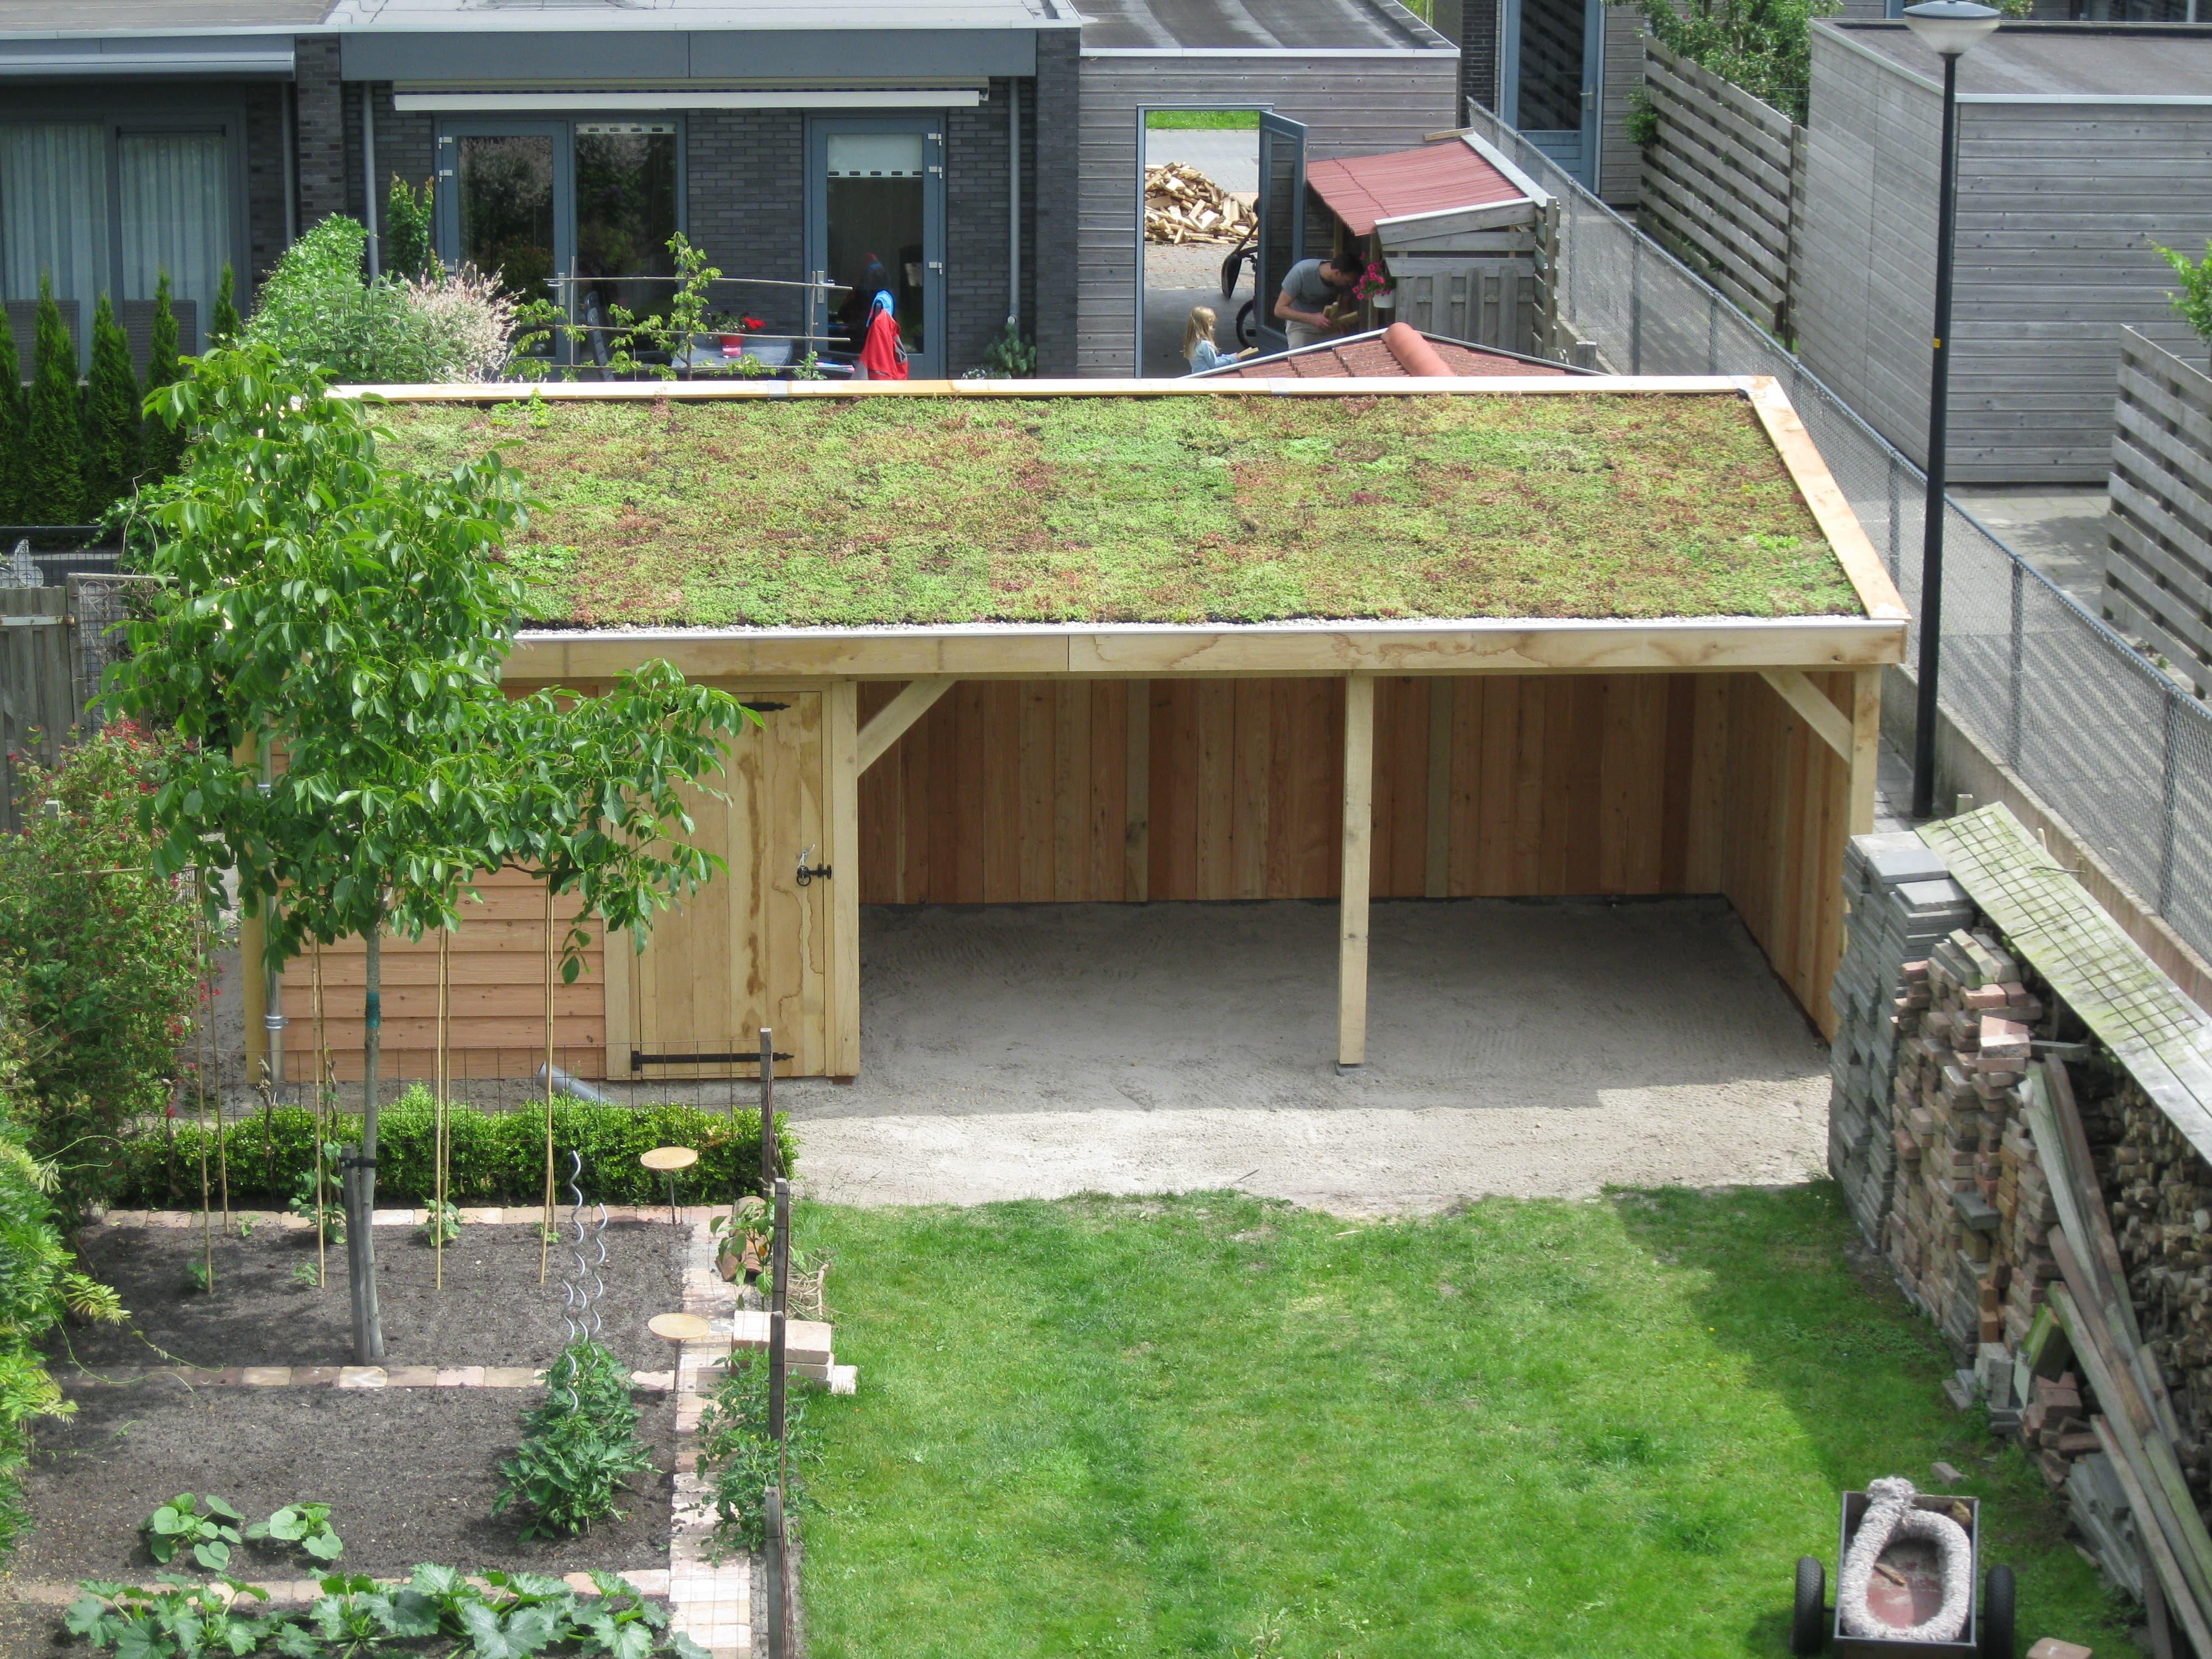 Houten-tuinhuis-met-tuinkamer-groendak-2-min - Tuinhuis met Groendak